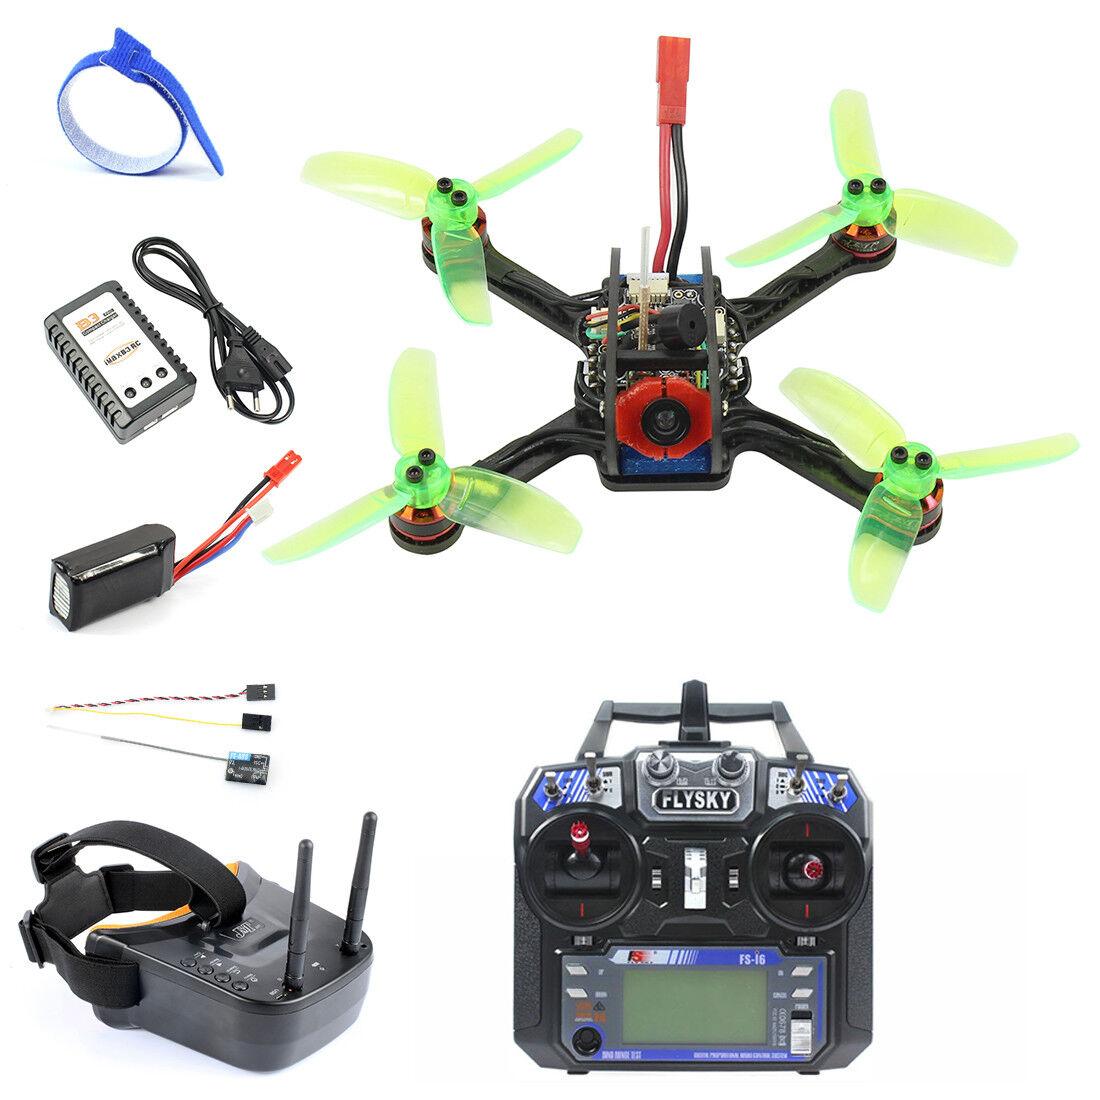 Mini - f3 osd  rc fpv - drohne quadcopter 700tvl kamera vtx goggle 10a